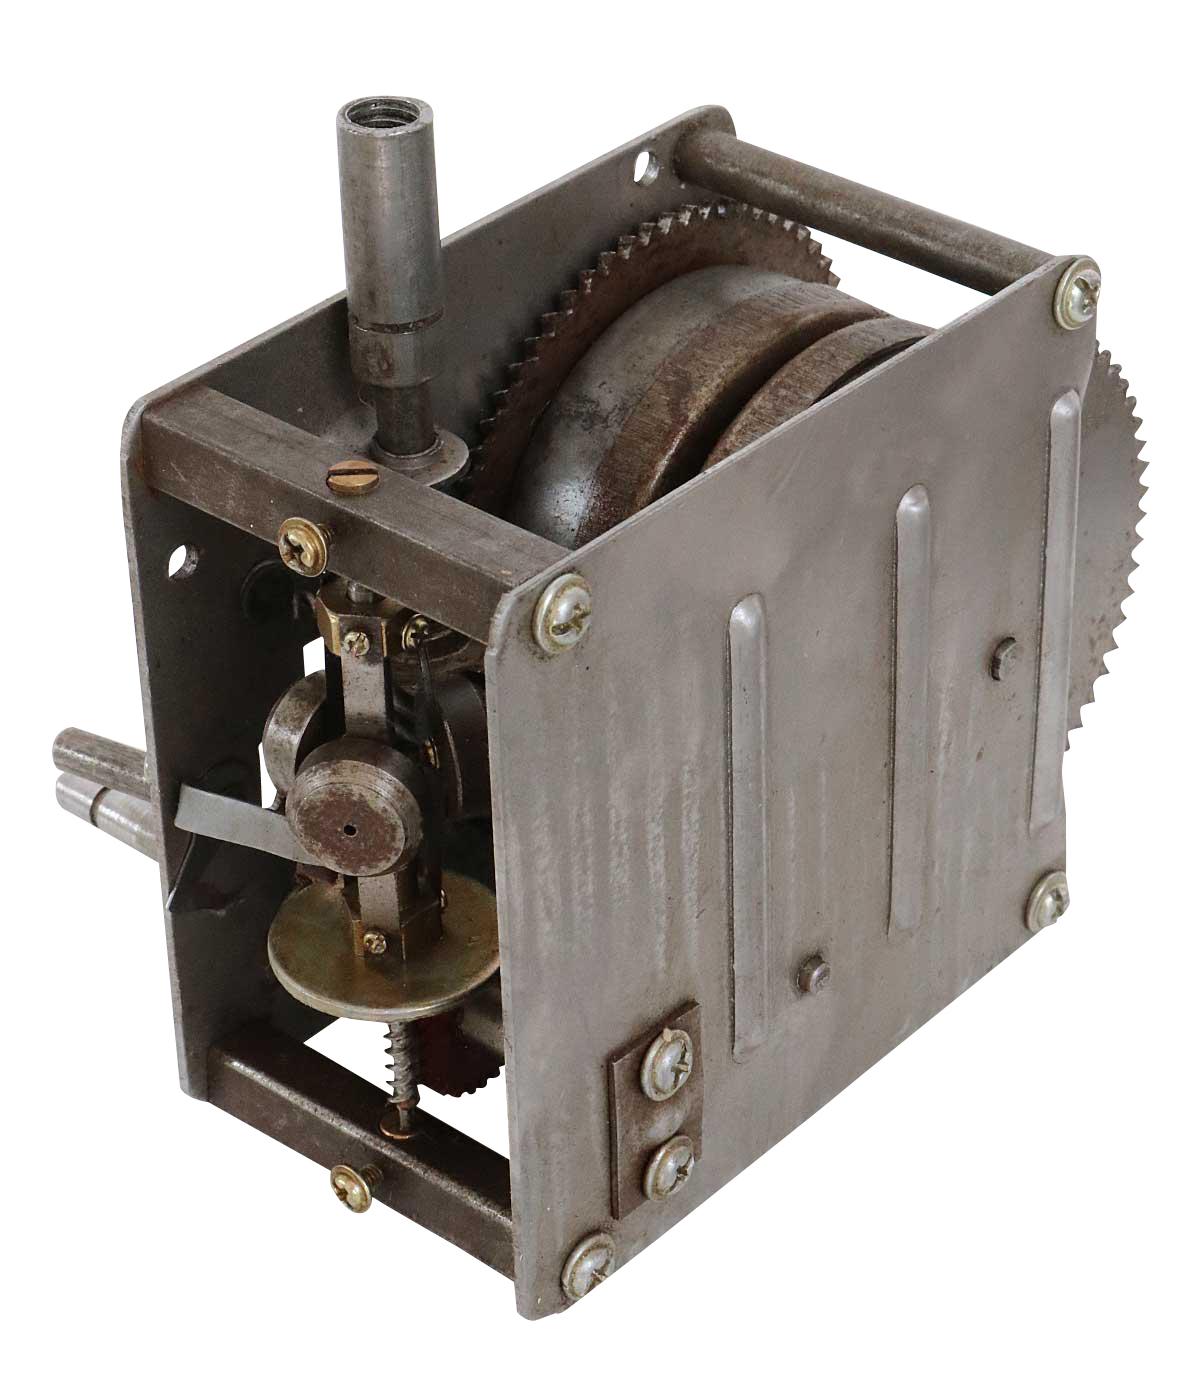 Grammophon motor plattenteller kurbel set ersatzteil antik for Ebay motors warehouse in billings montana